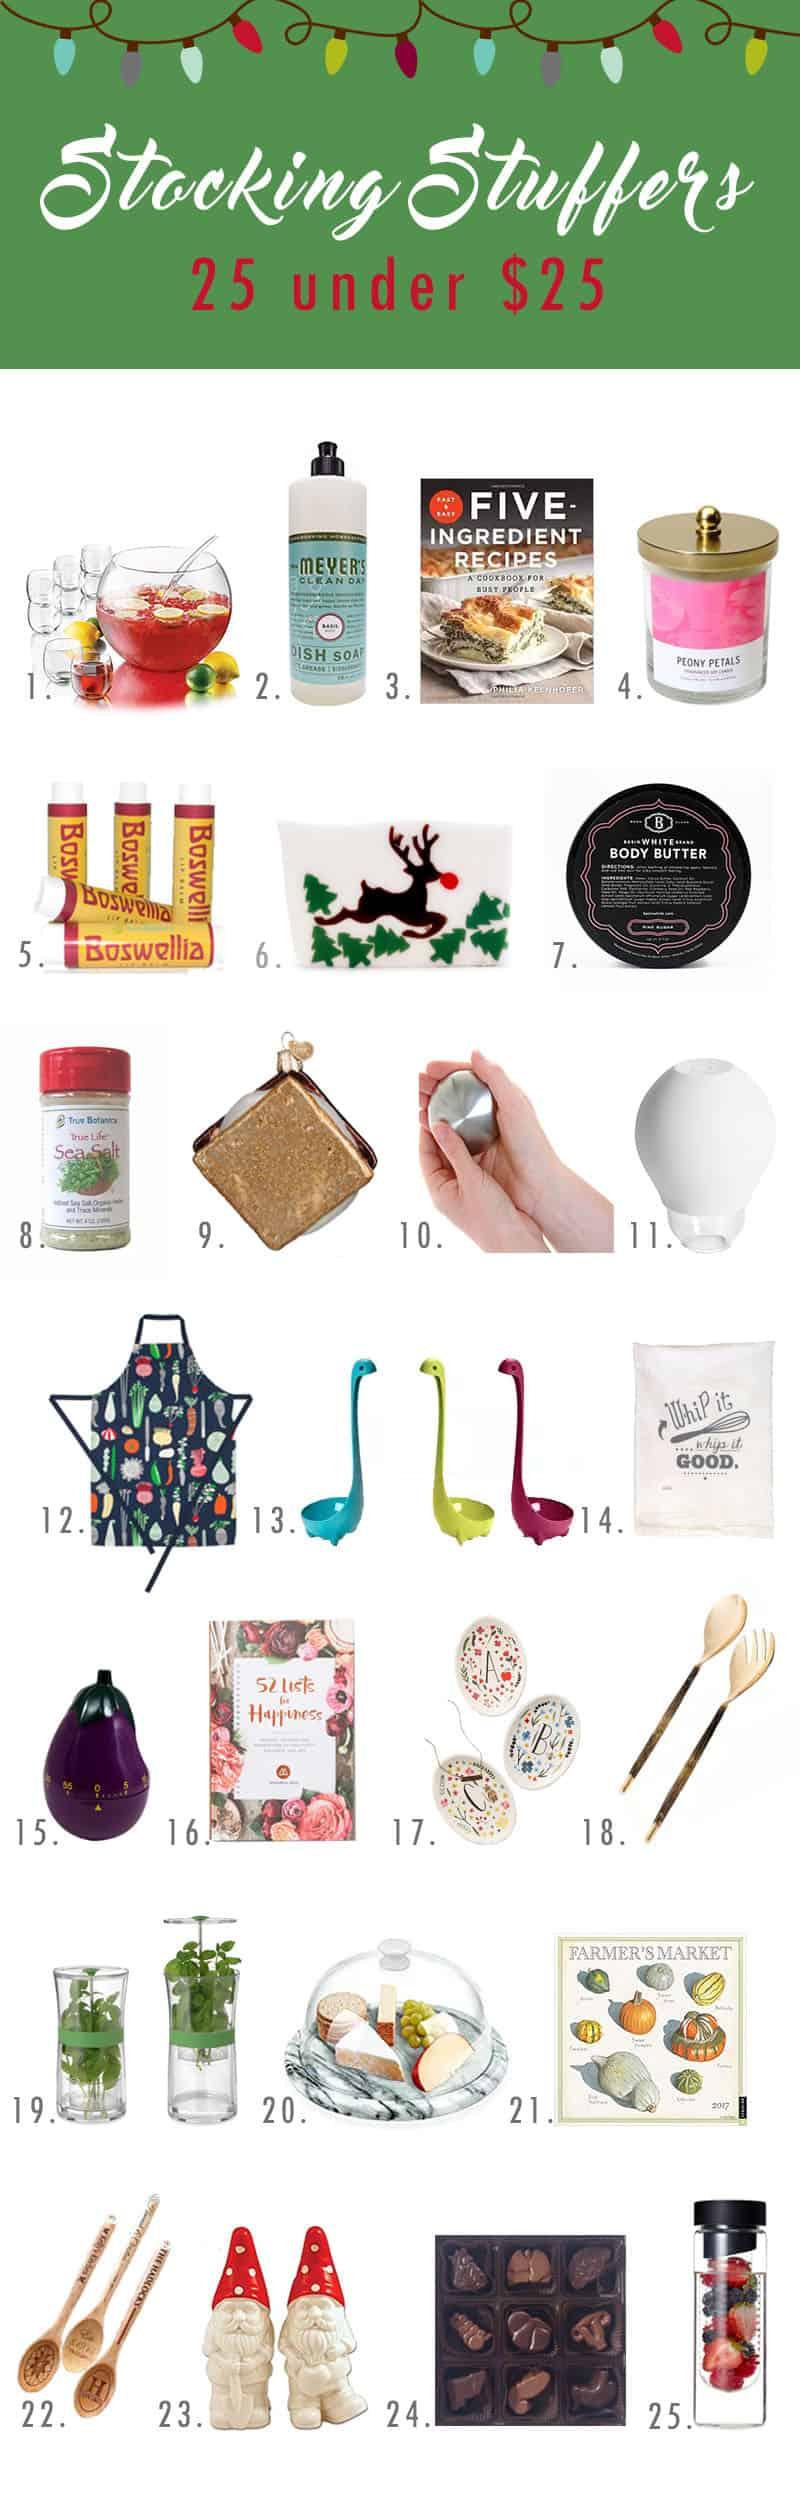 The best stocking stuffers under $25